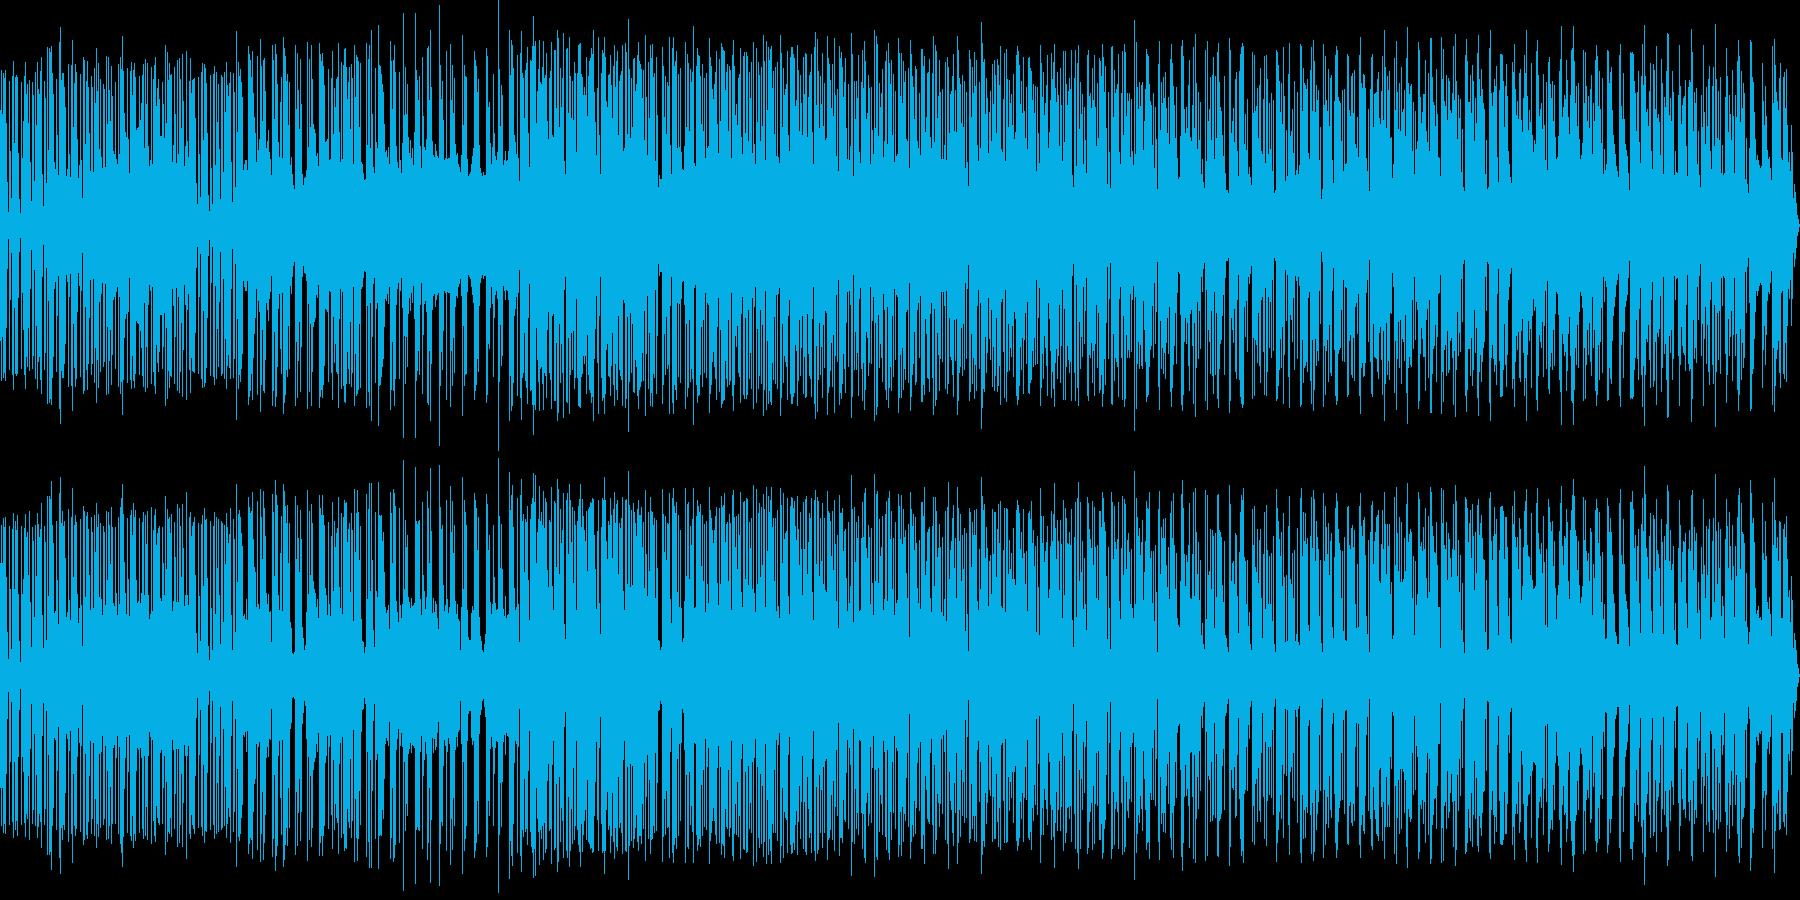 upの再生済みの波形